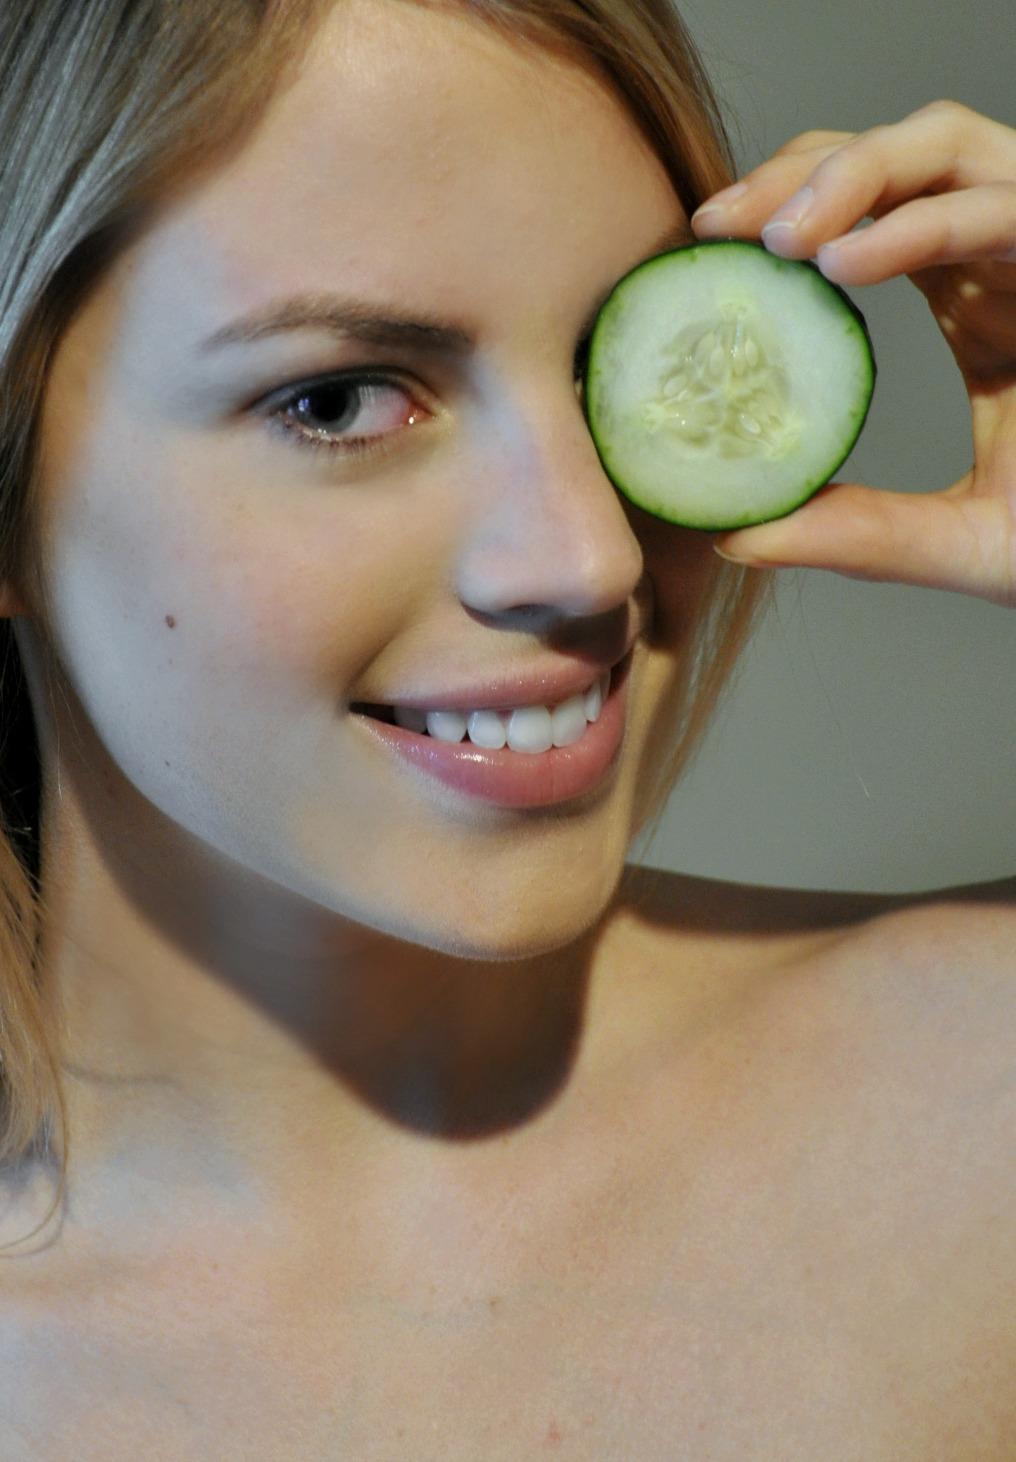 quick-tips-to-banish-puffy-eyes